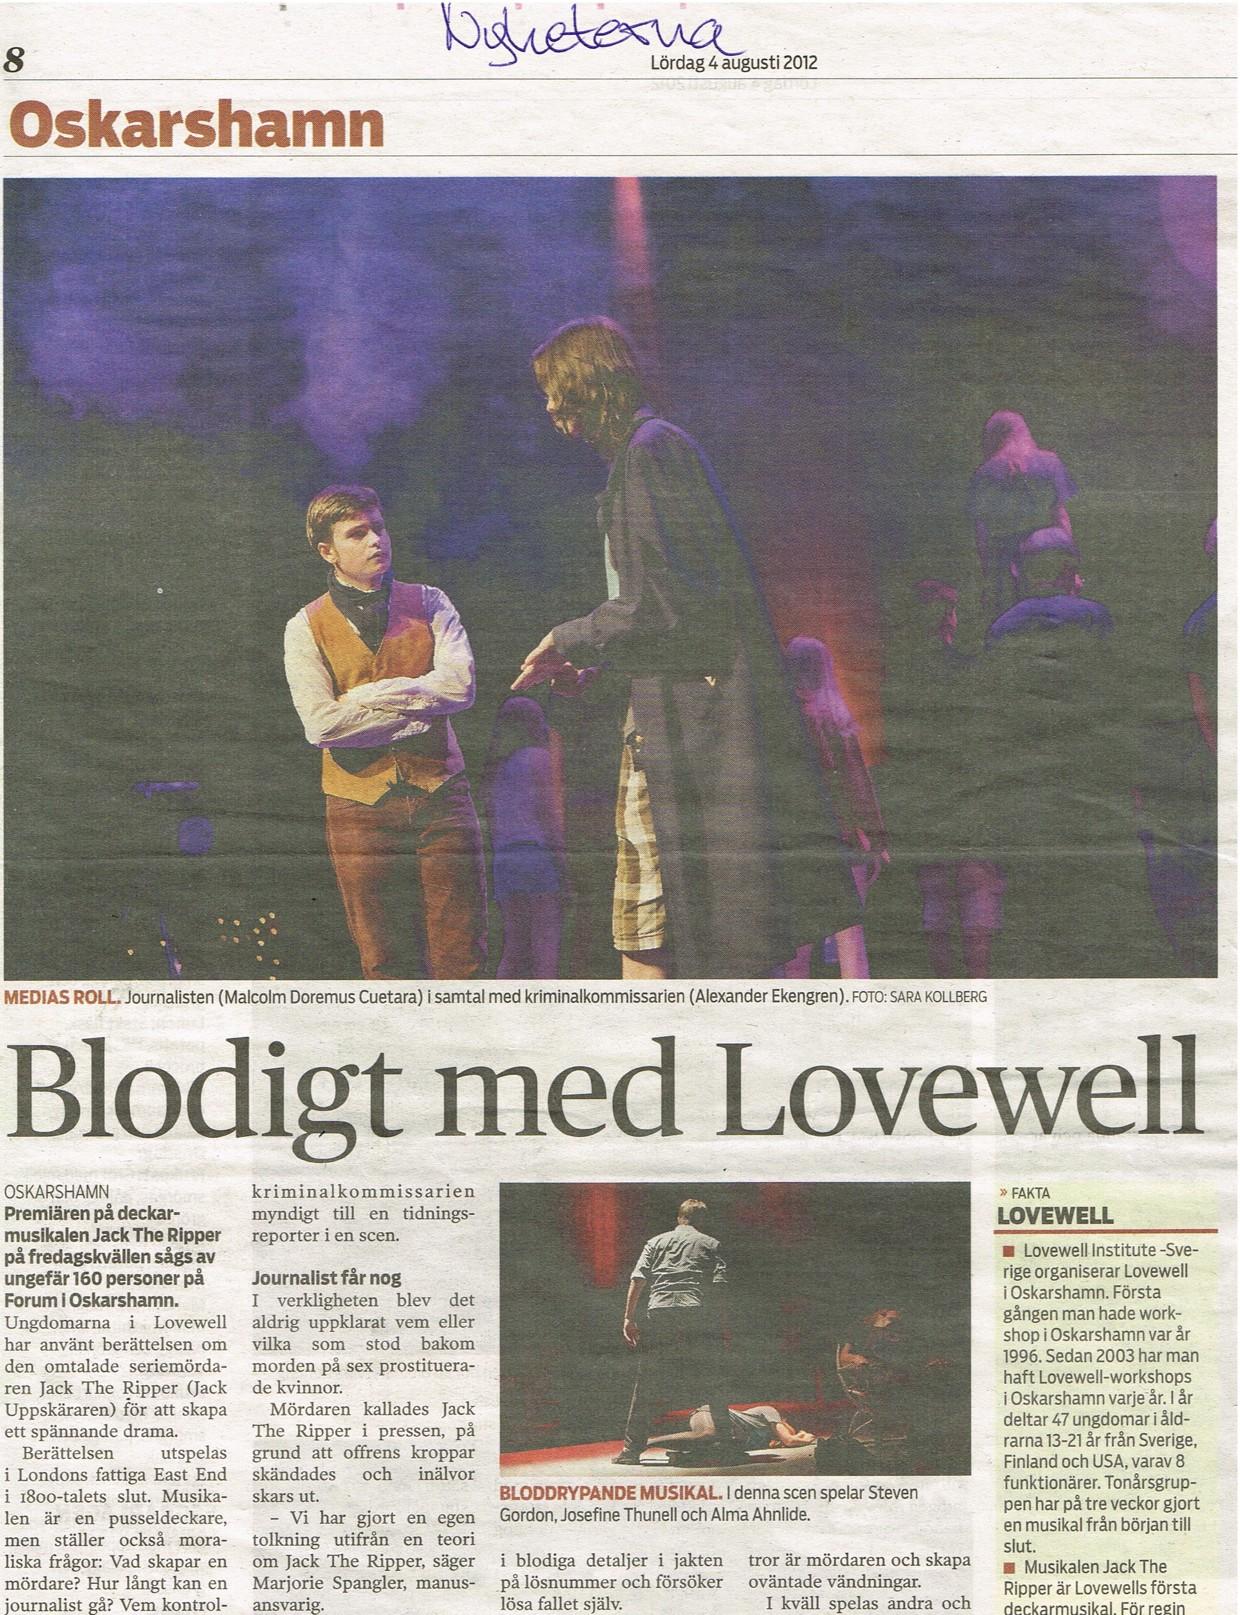 Nyheterna August 4th, 2012